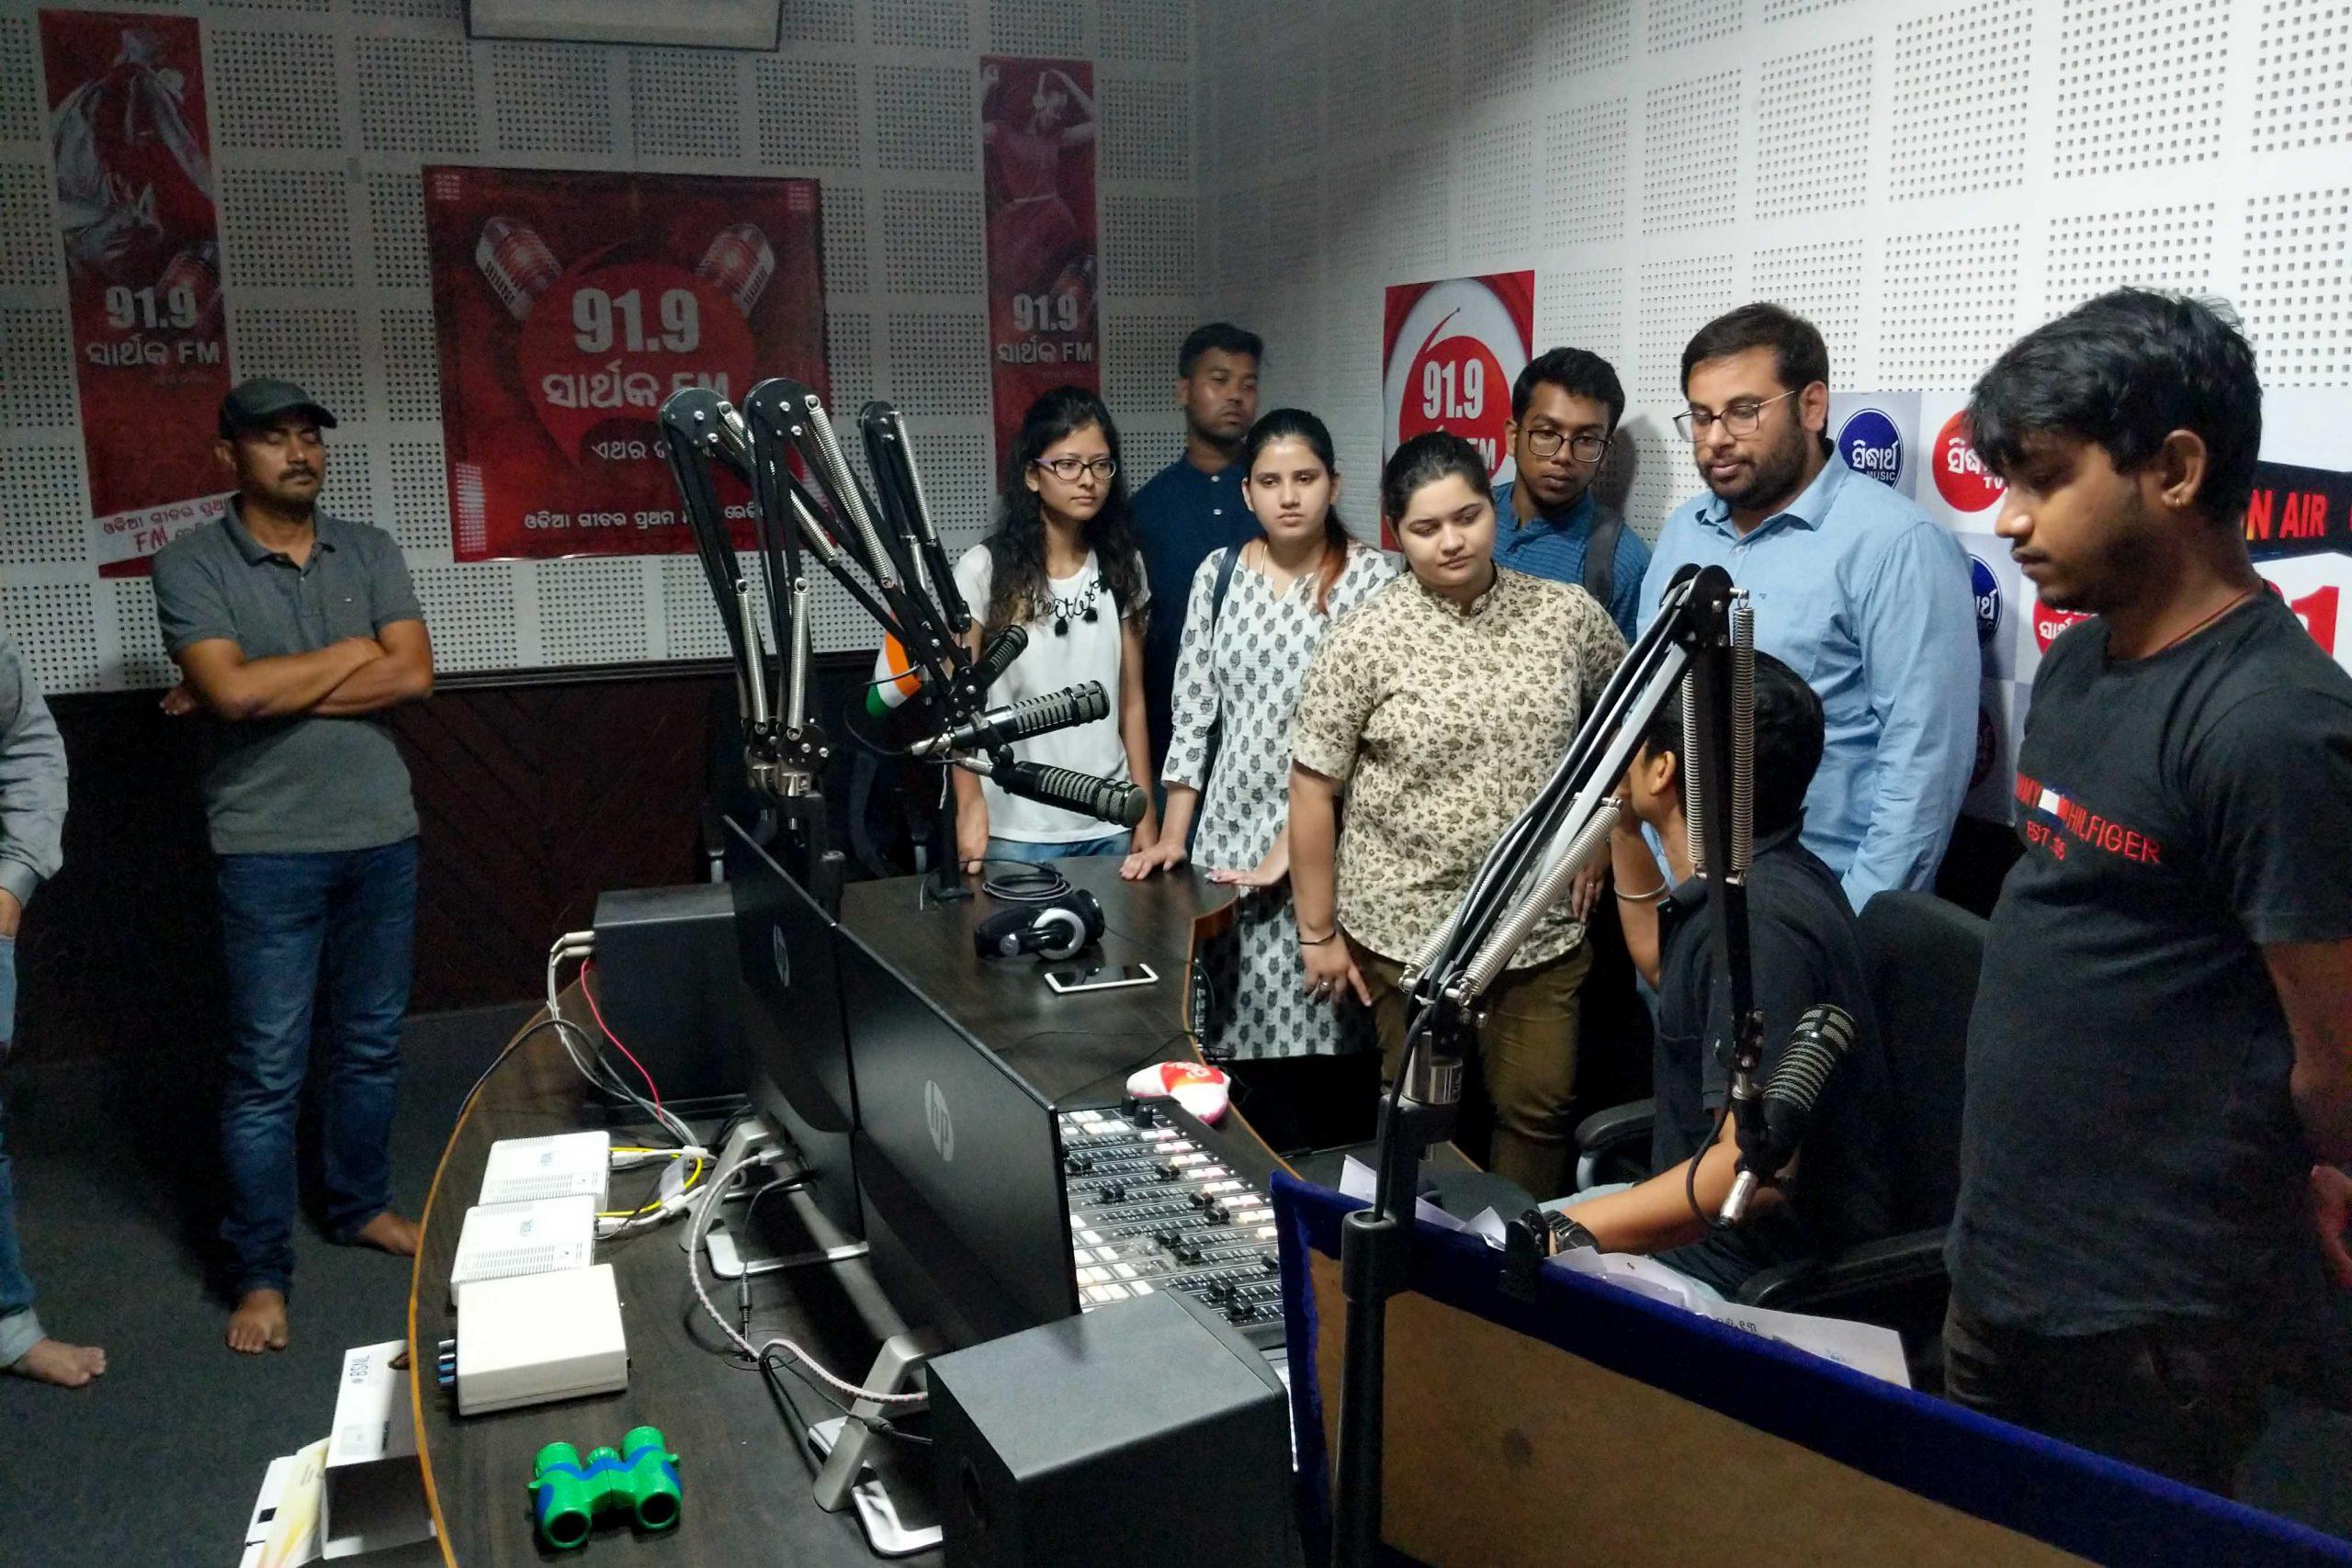 xcomm_Sarthak Fm and Sidharth TV_1